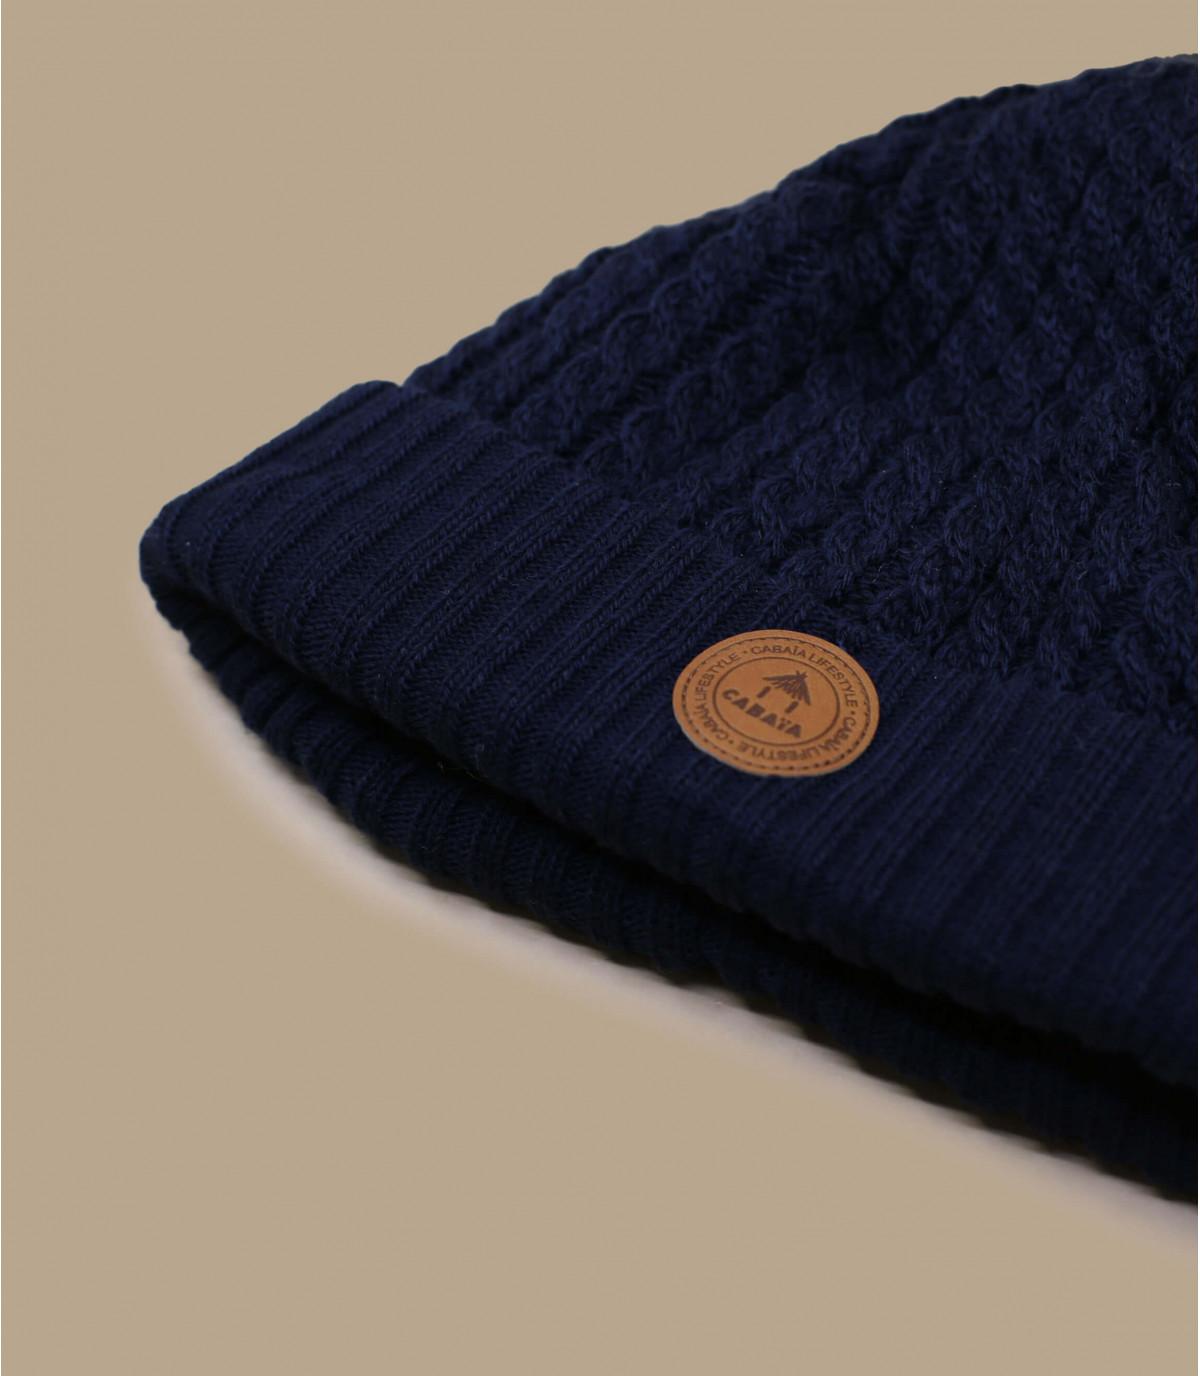 Détails Royal Mojito dark blue - image 3